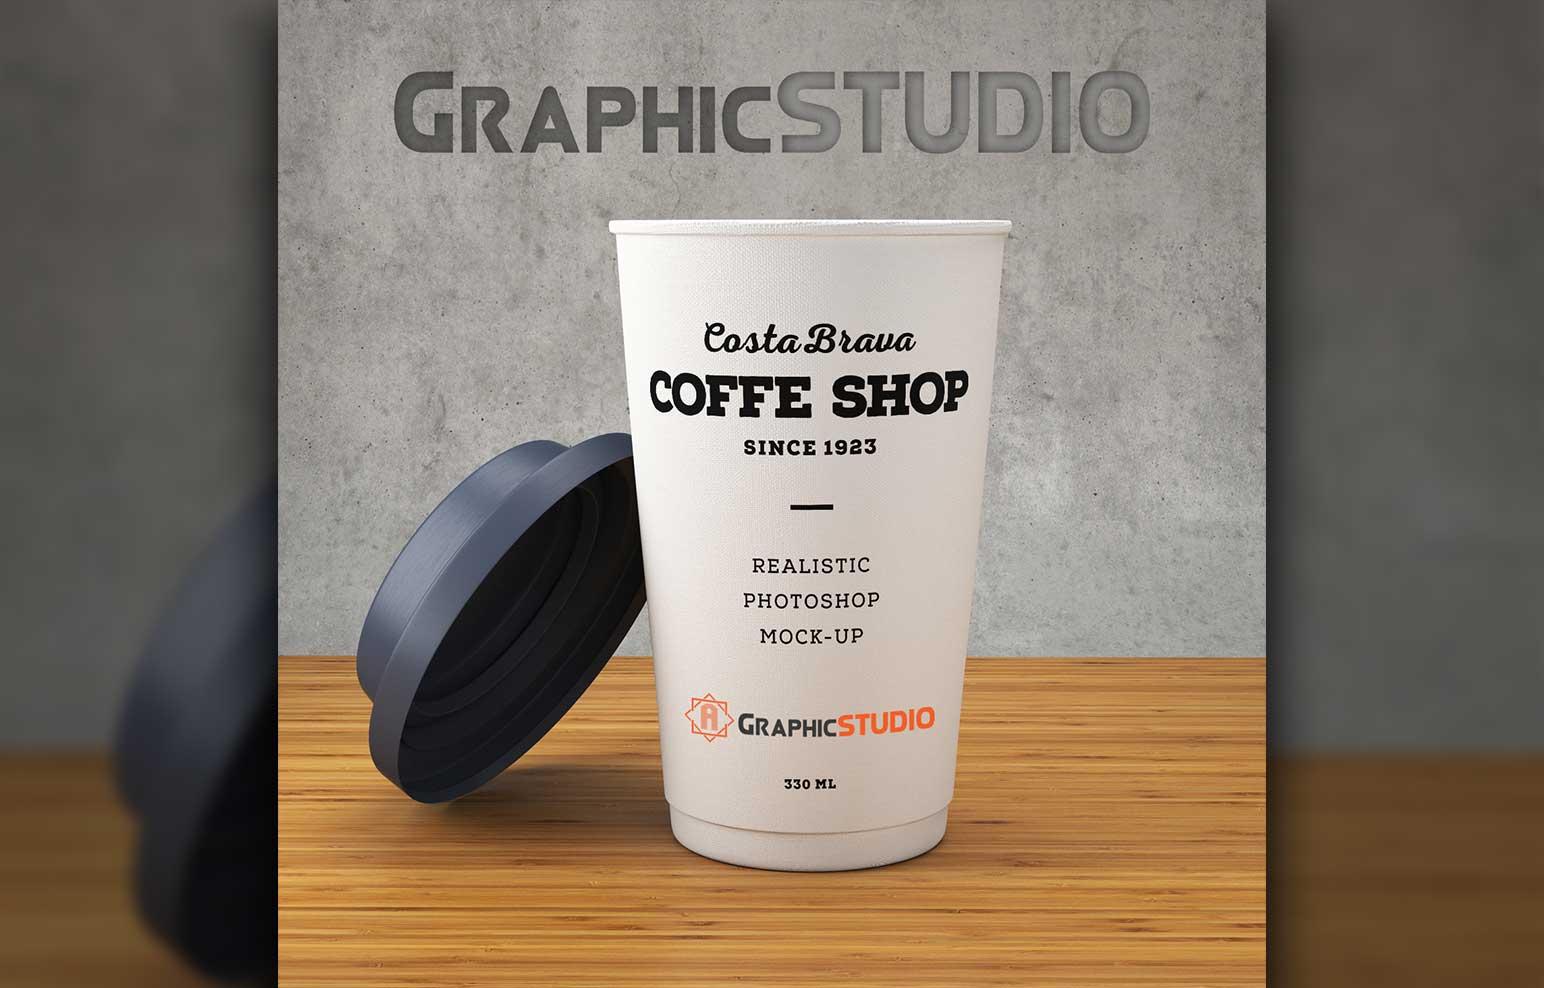 Potreben vi e dizajn za na sekakvi casi? - Graficki dizajn , Потребен ви е дизајн за на секакви чаши? - Графички дизајн